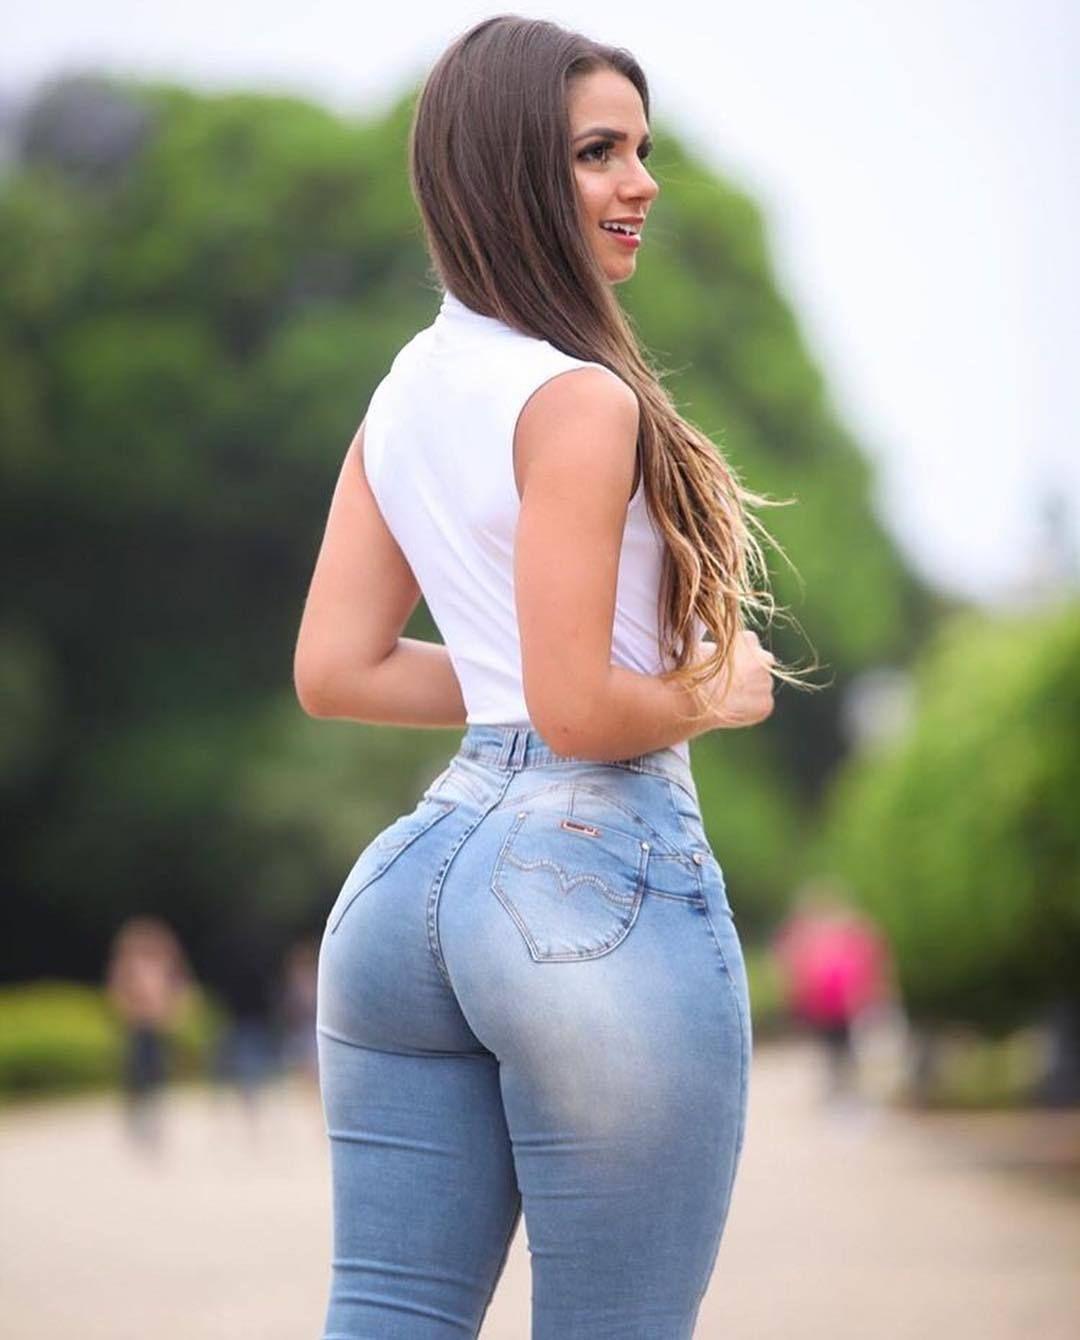 Hot busty ebony booty shaking photo 308